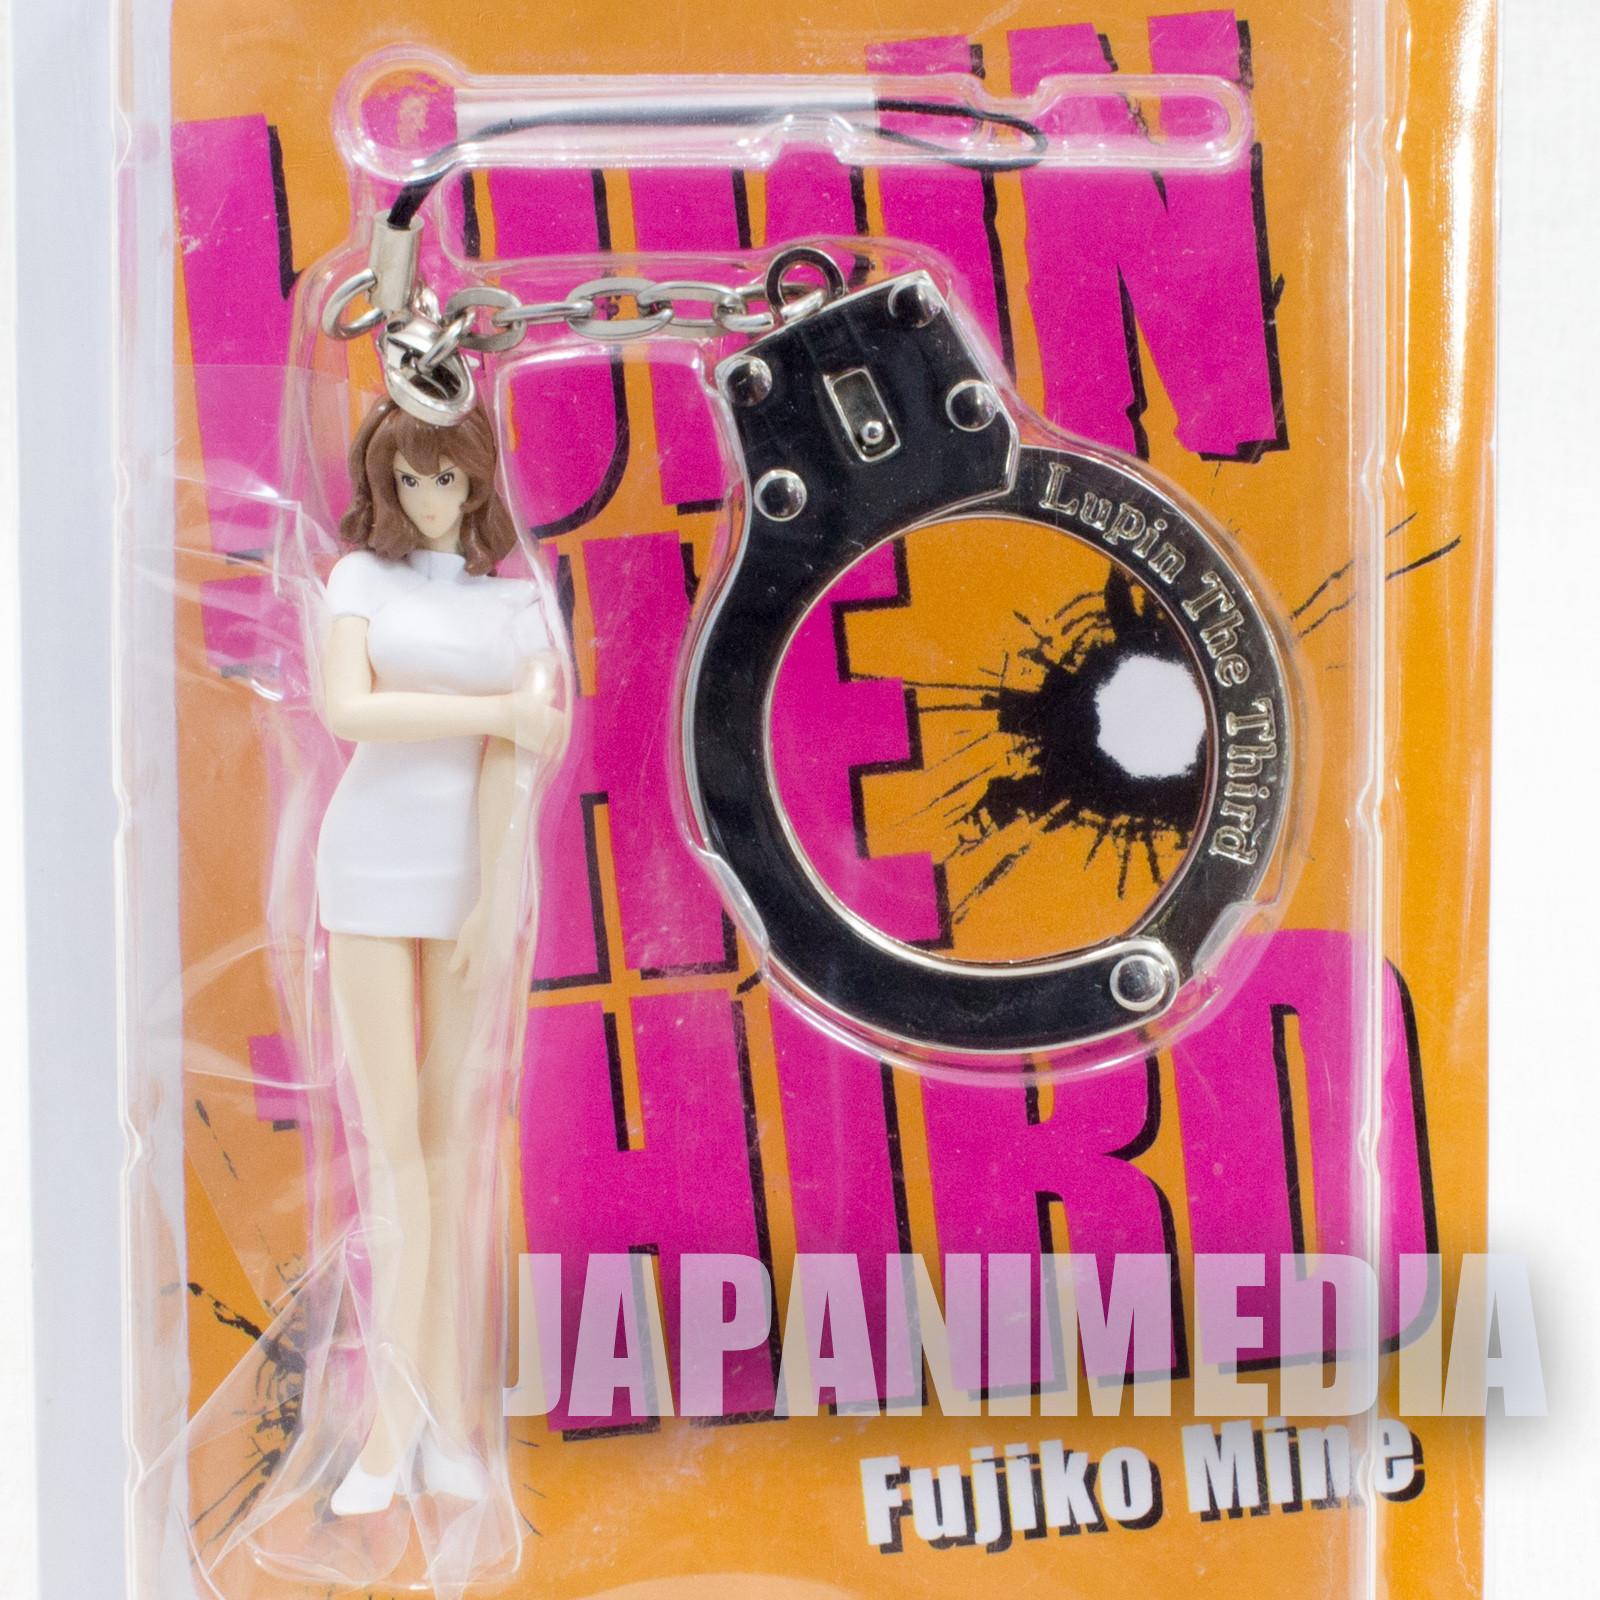 Lupin the Third (3rd) Fujiko Mine Handcuff & Figure Strap Banpresto JAPAN ANIME MANGA